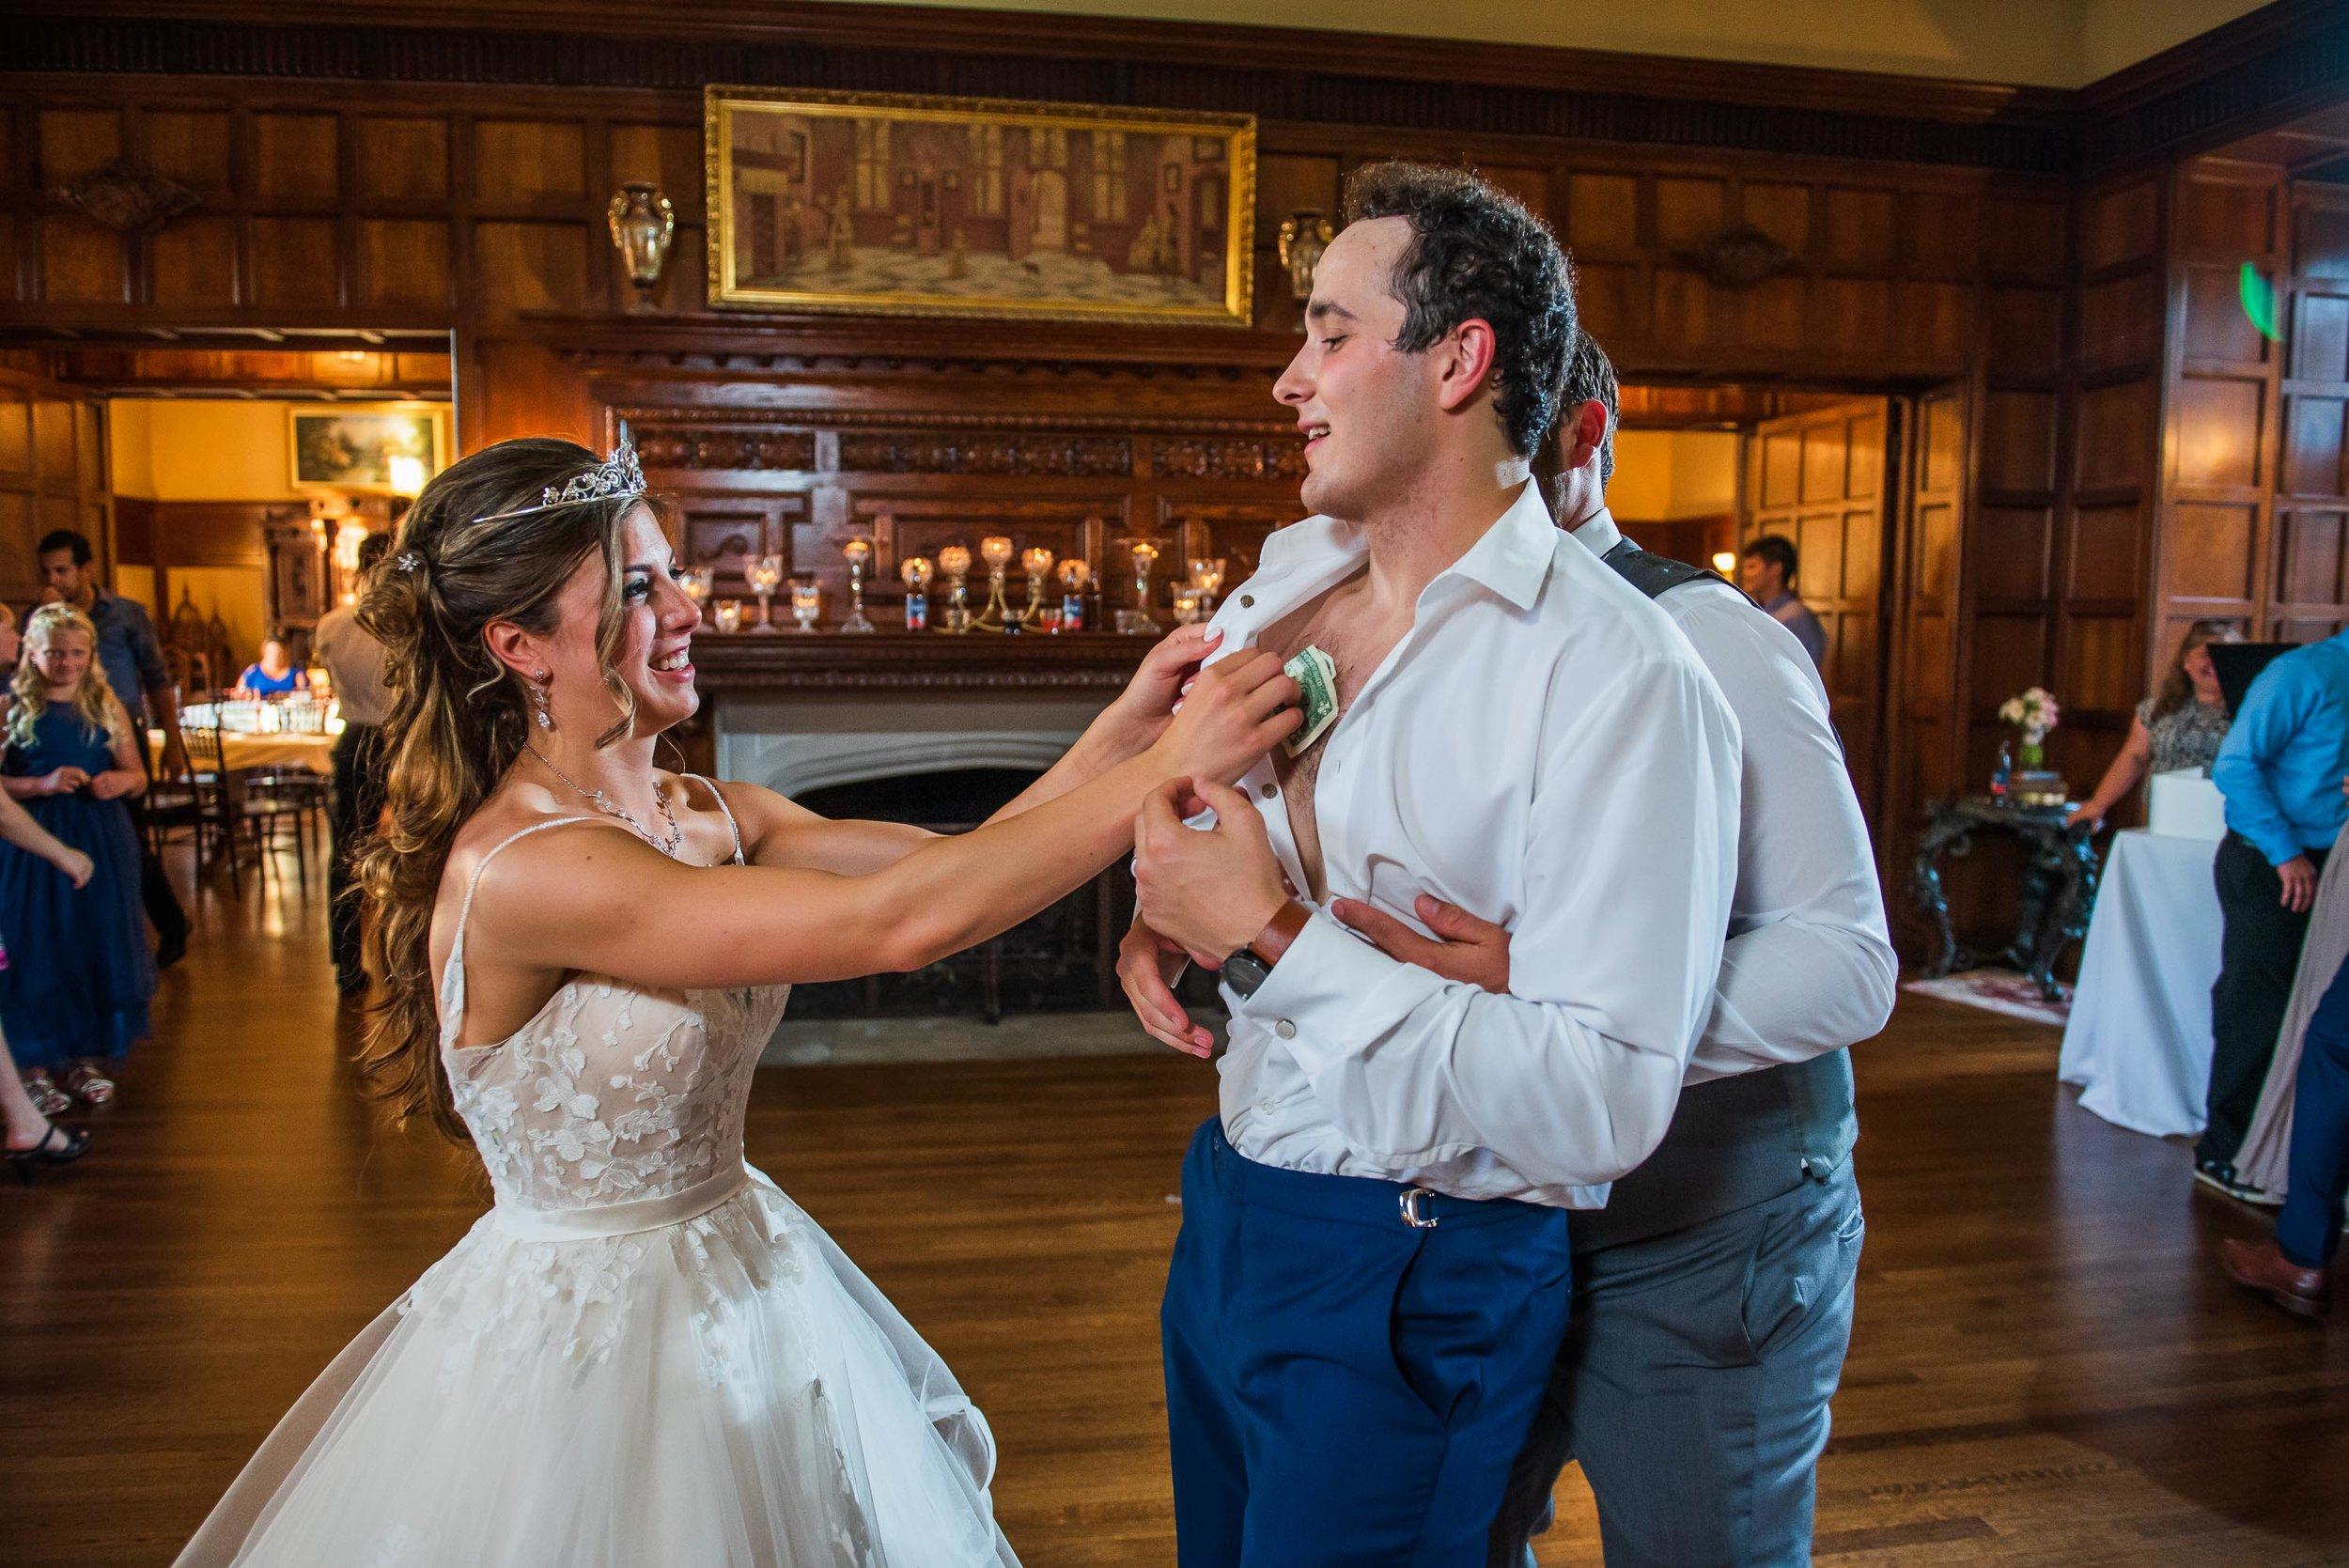 thornewood castle wedding 79.jpg